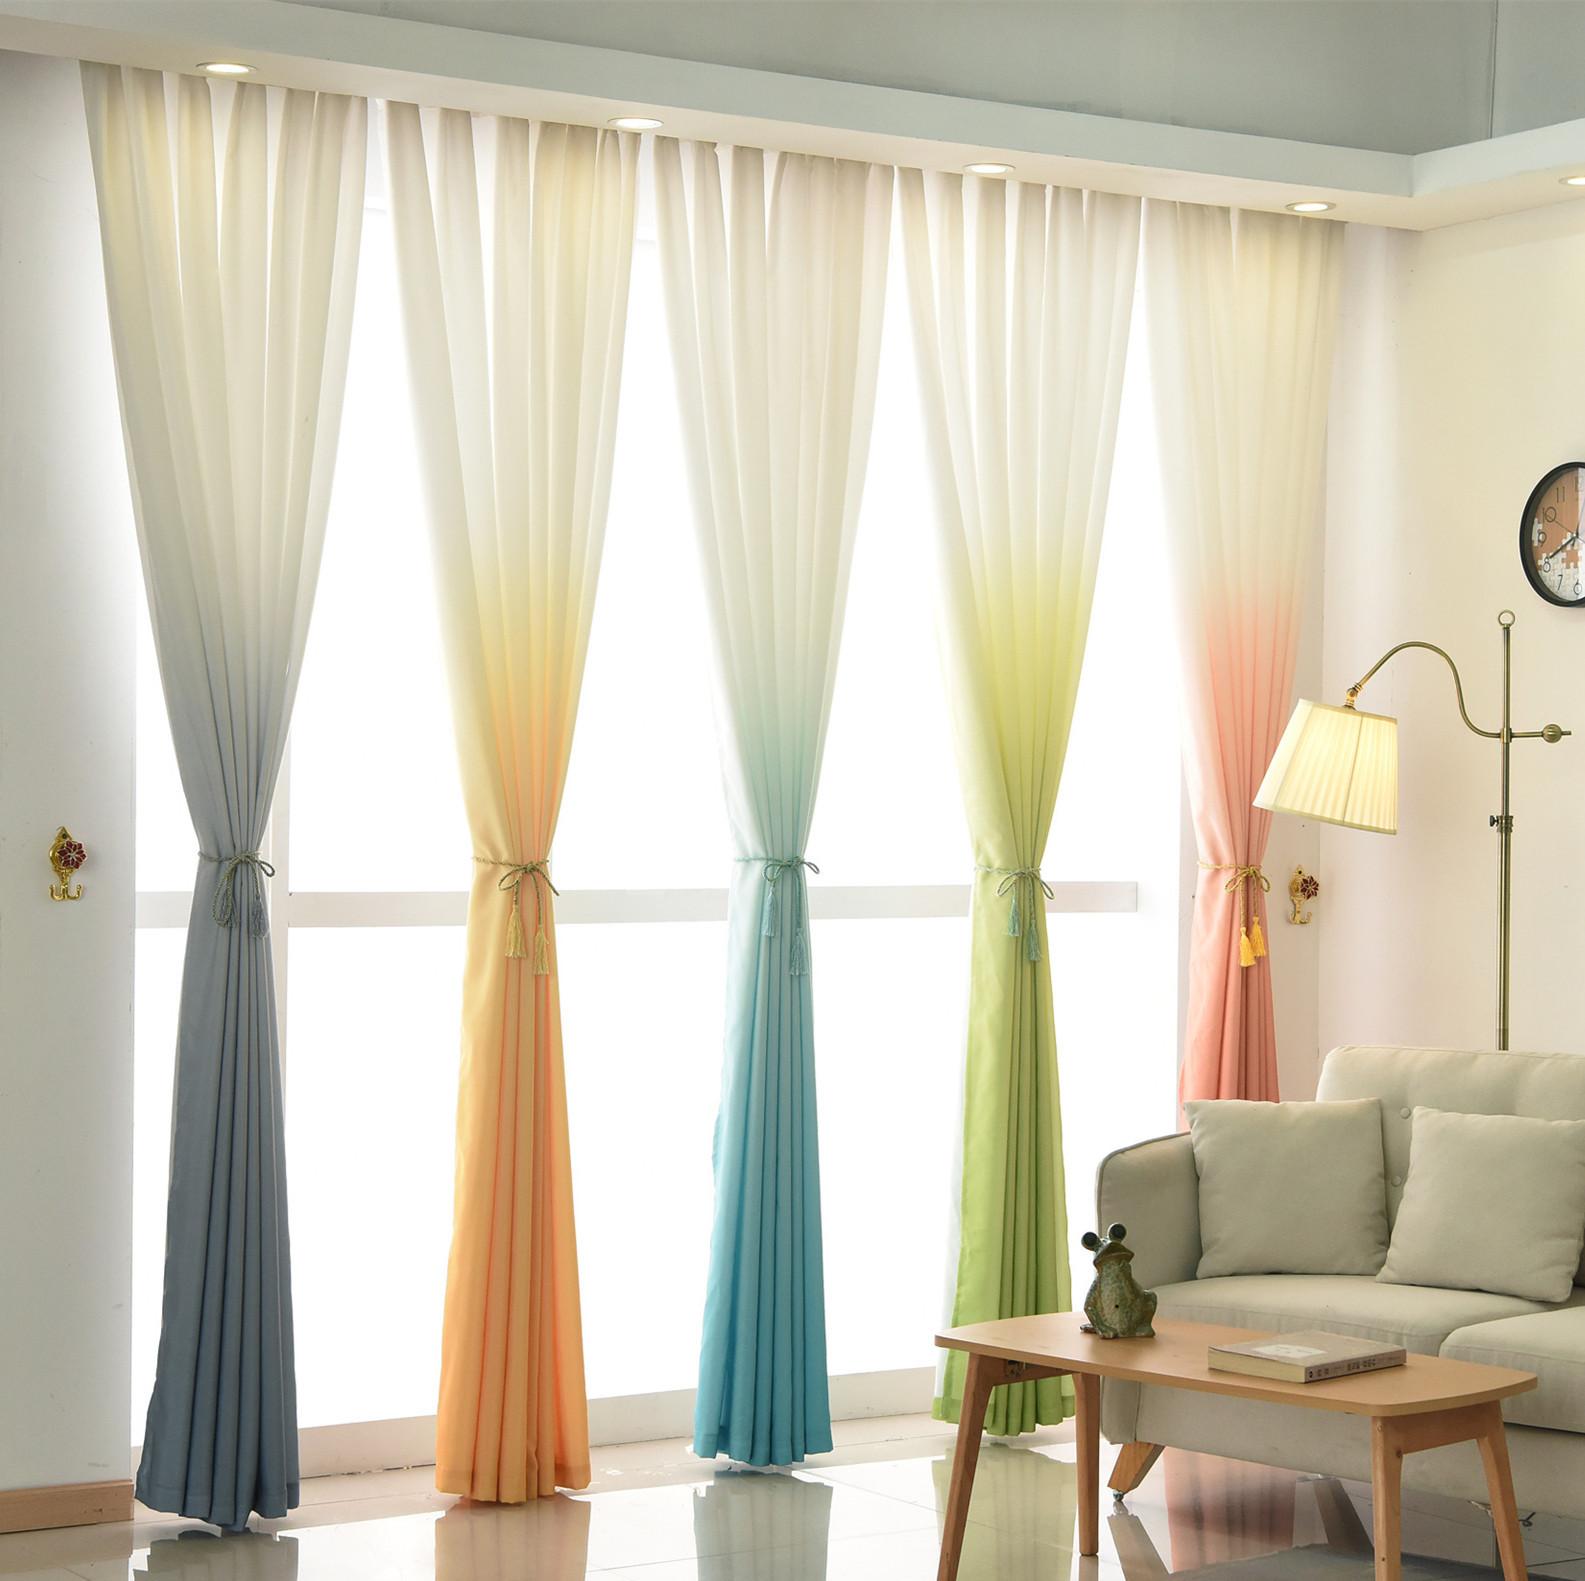 Cocina color p 250 rpura 7 - Arco Iris De Color S Lido Verano Cortina De La Ventana Moderna Sala De Estar Dormitorio Moderno